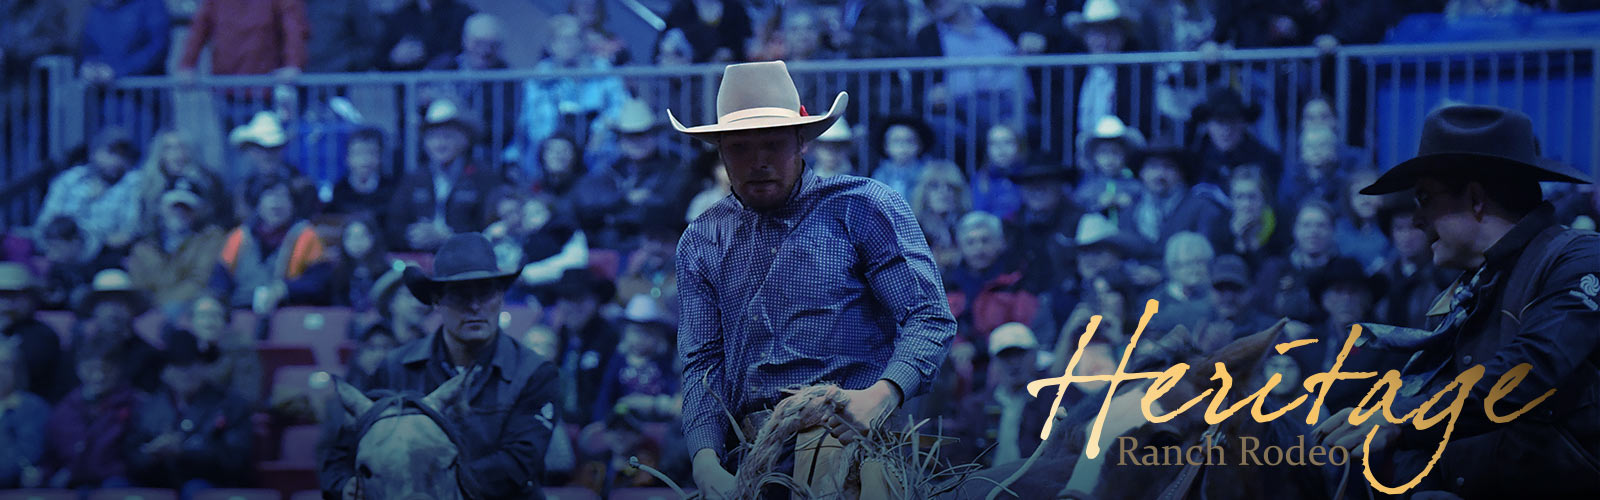 Heritage Ranch Rodeo - Nov 7-9